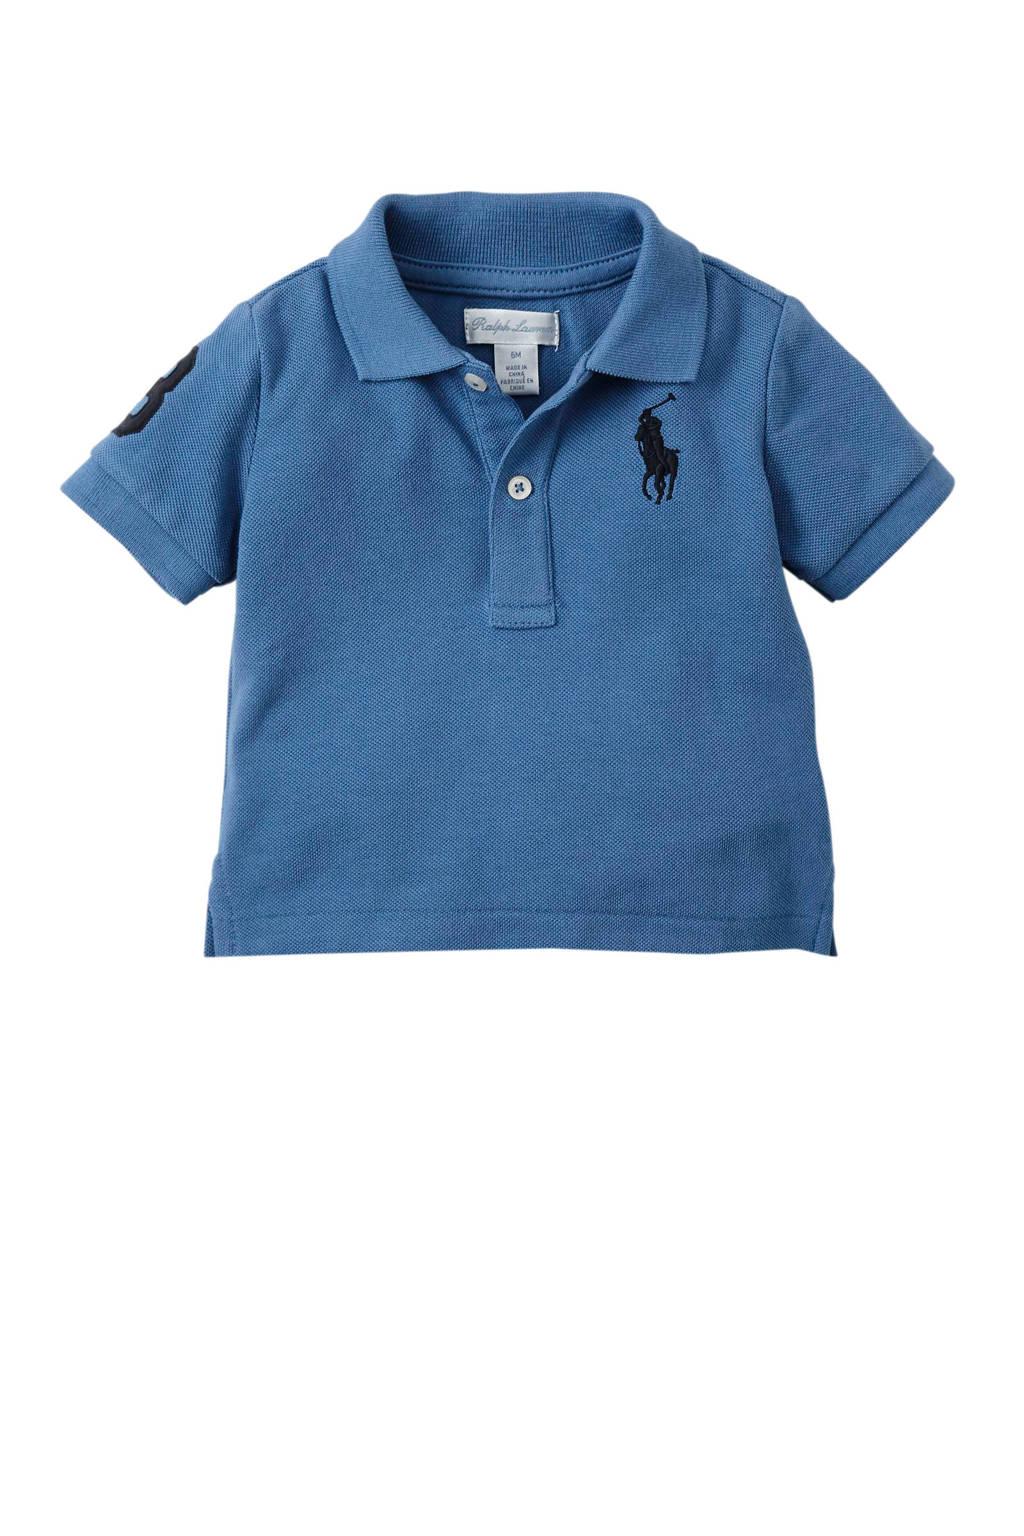 POLO Ralph Lauren baby polo met borduursel blauw, Blauw